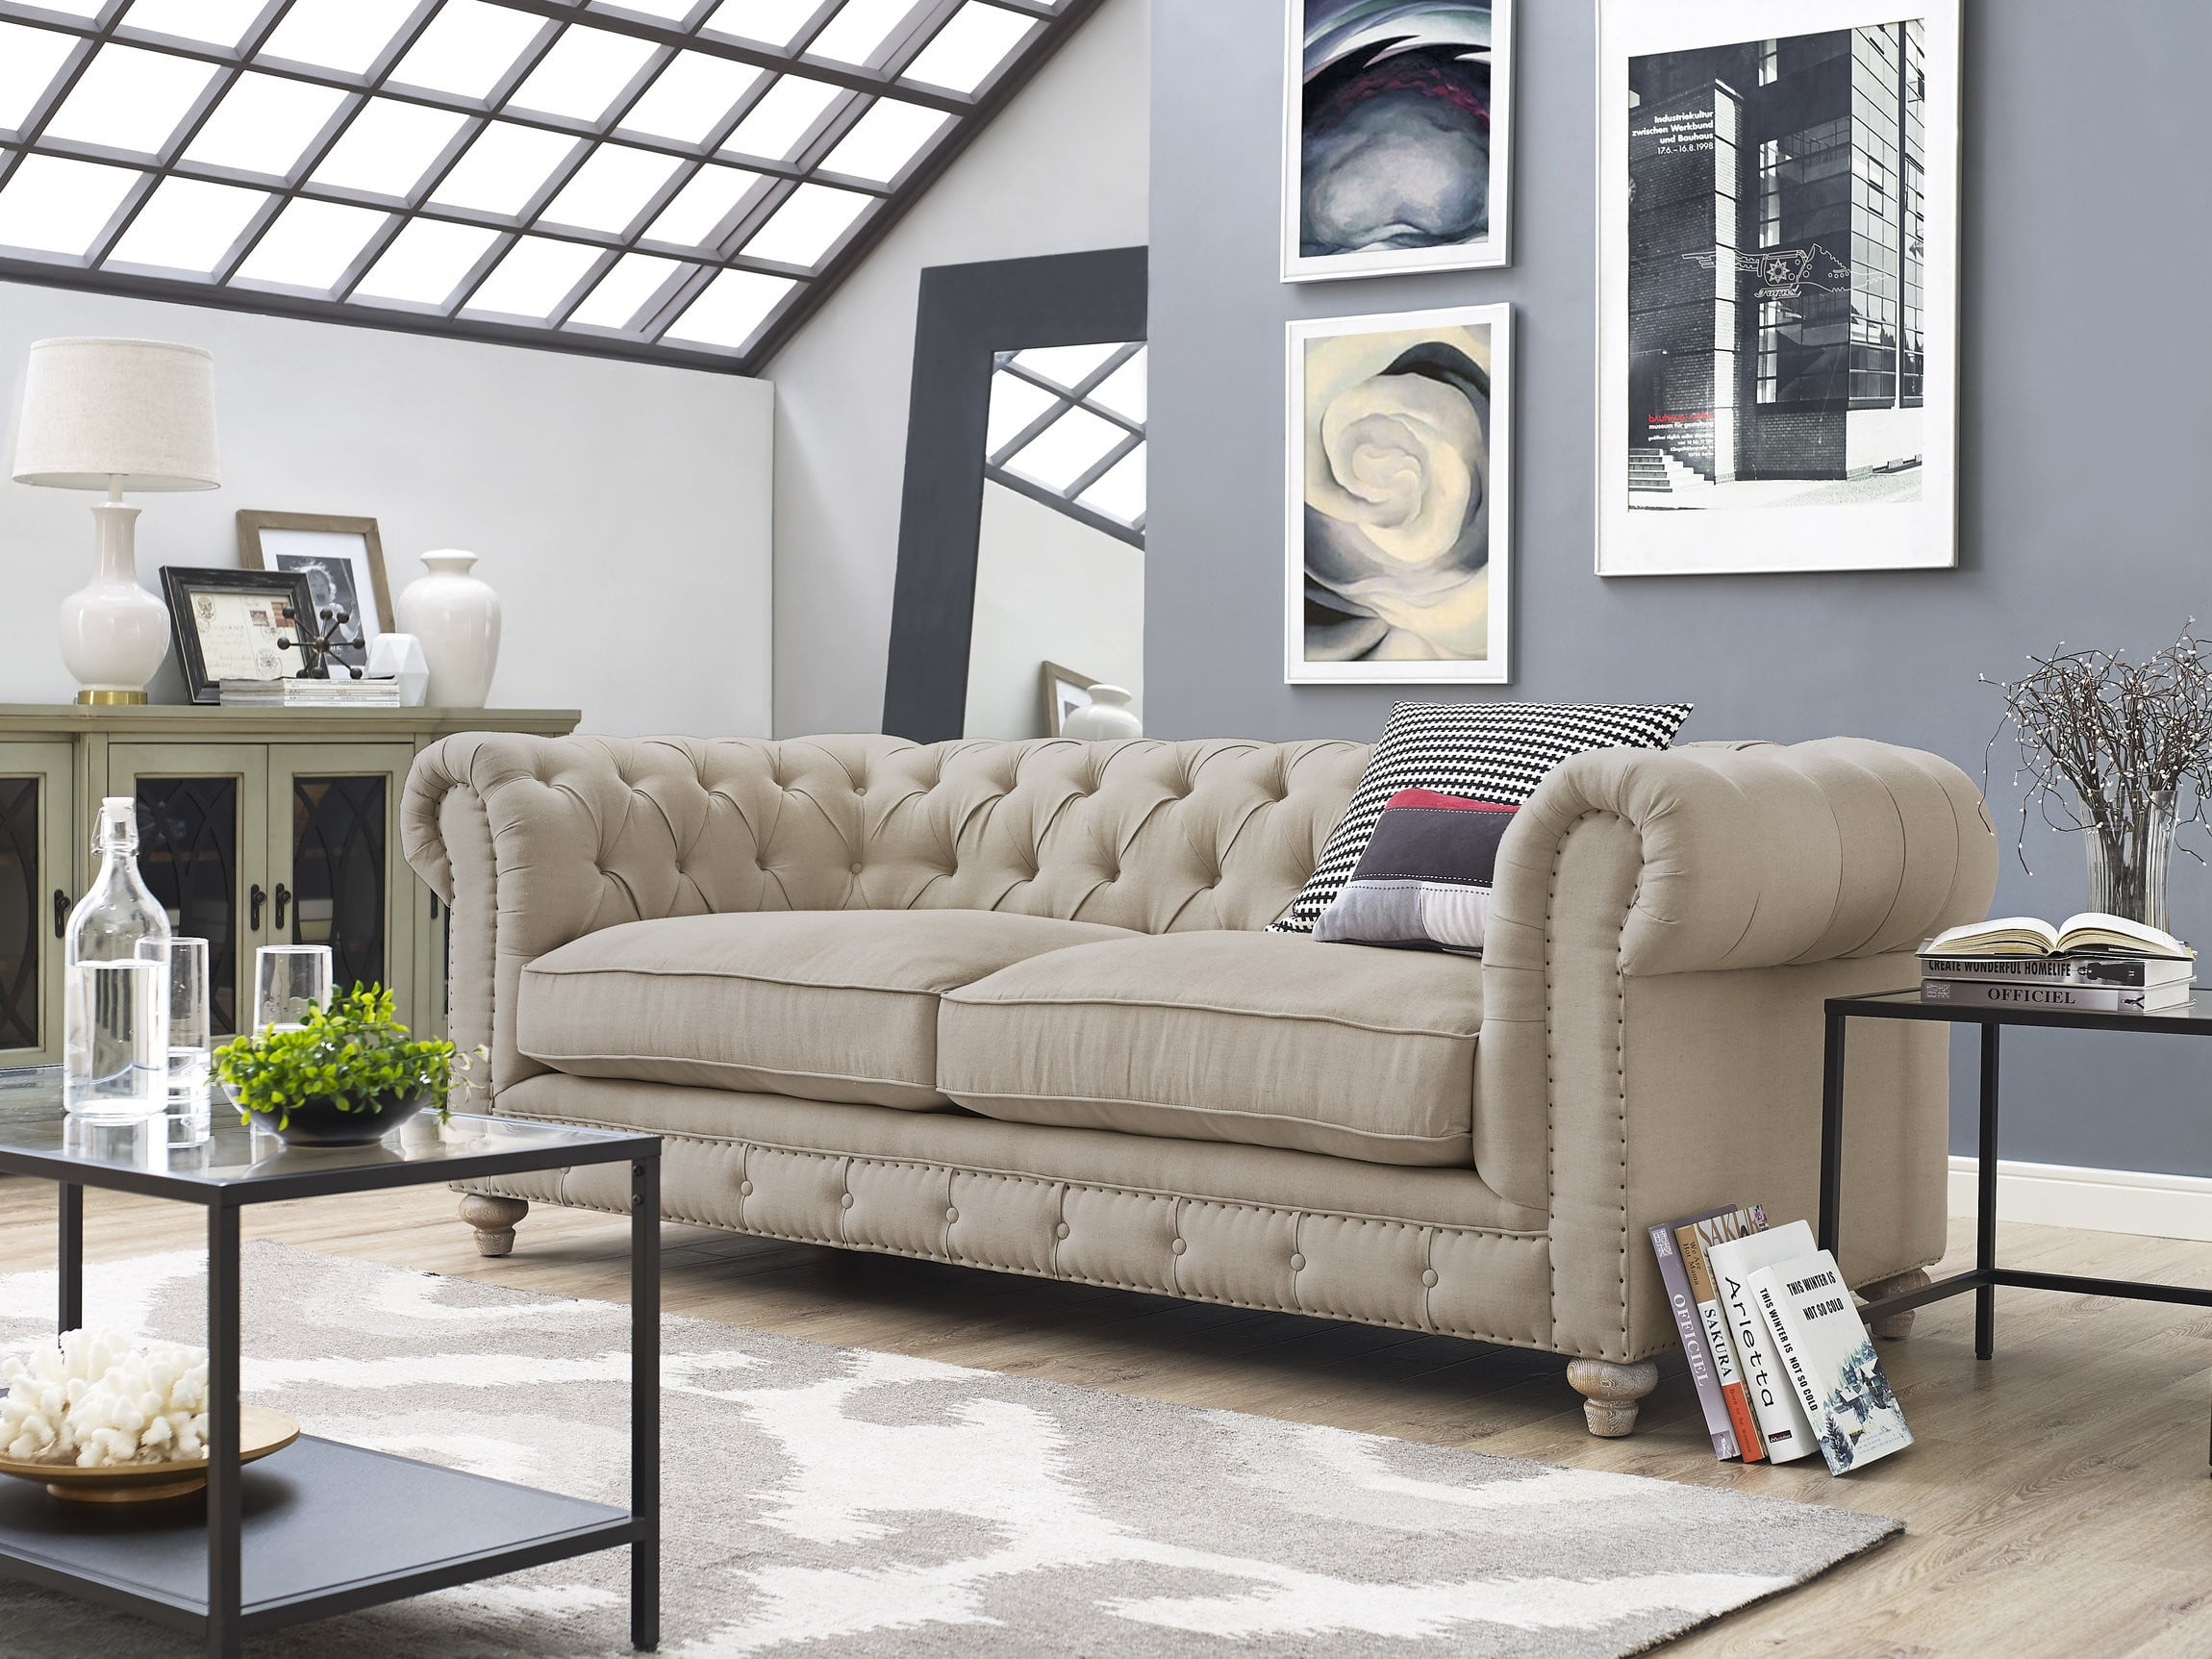 Oxford Beige Linen Sofa from TOV TOV S19